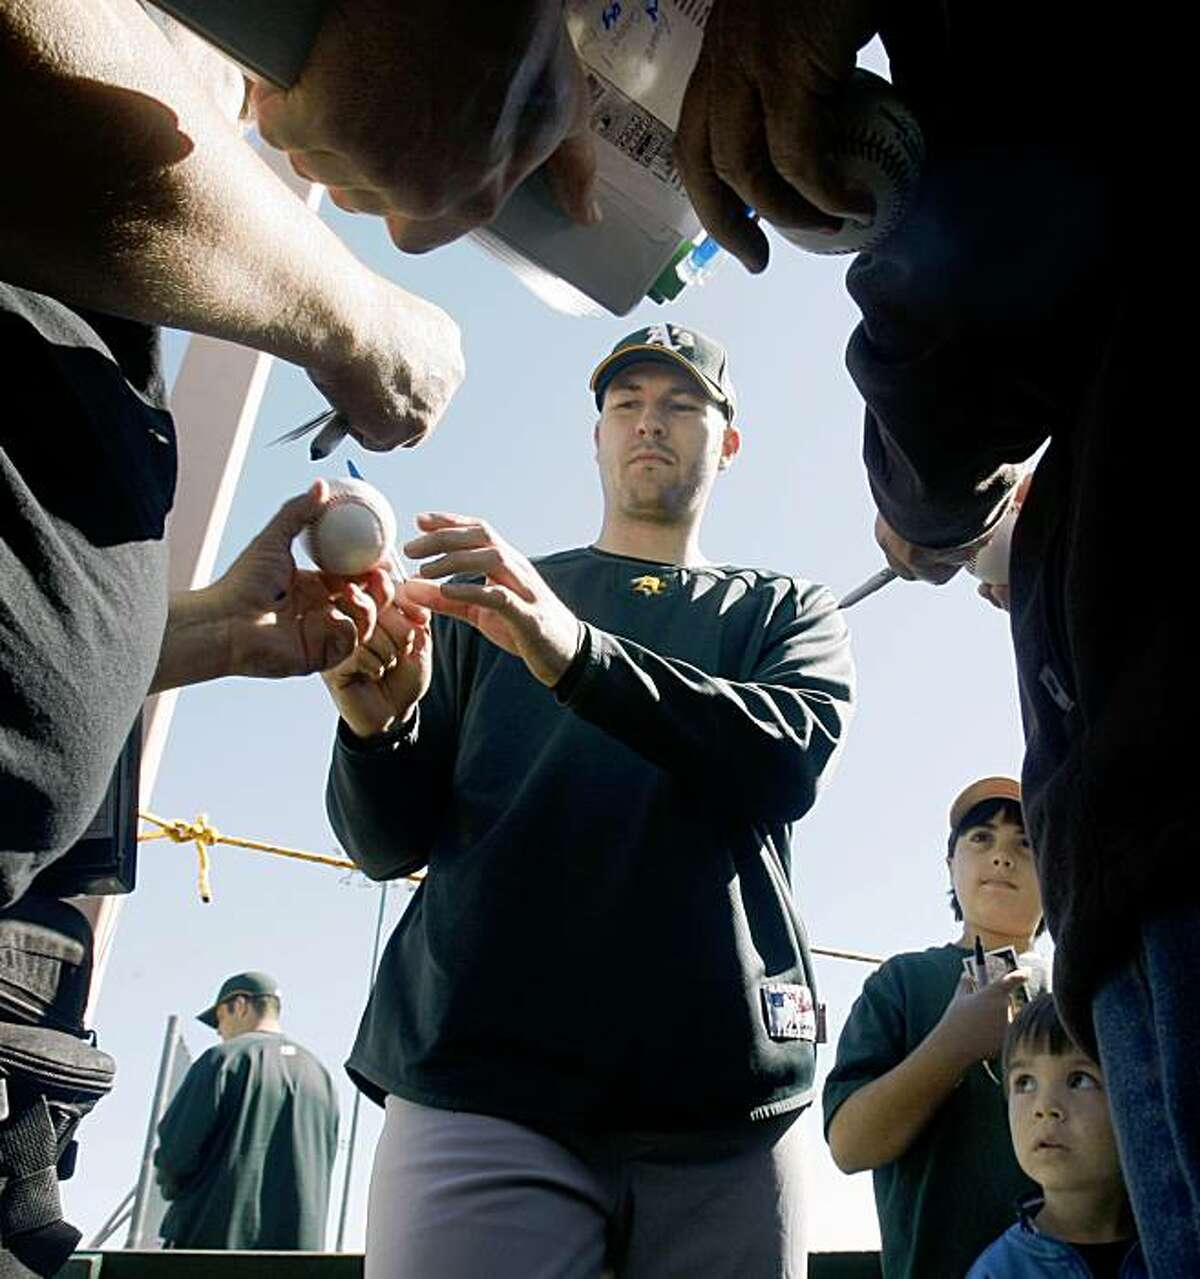 Oakland Athletics pitcher Justin Duchscherer signs autographs at Papago Baseball Complex Thursday February 19, 2009 in Phoenix Arizona